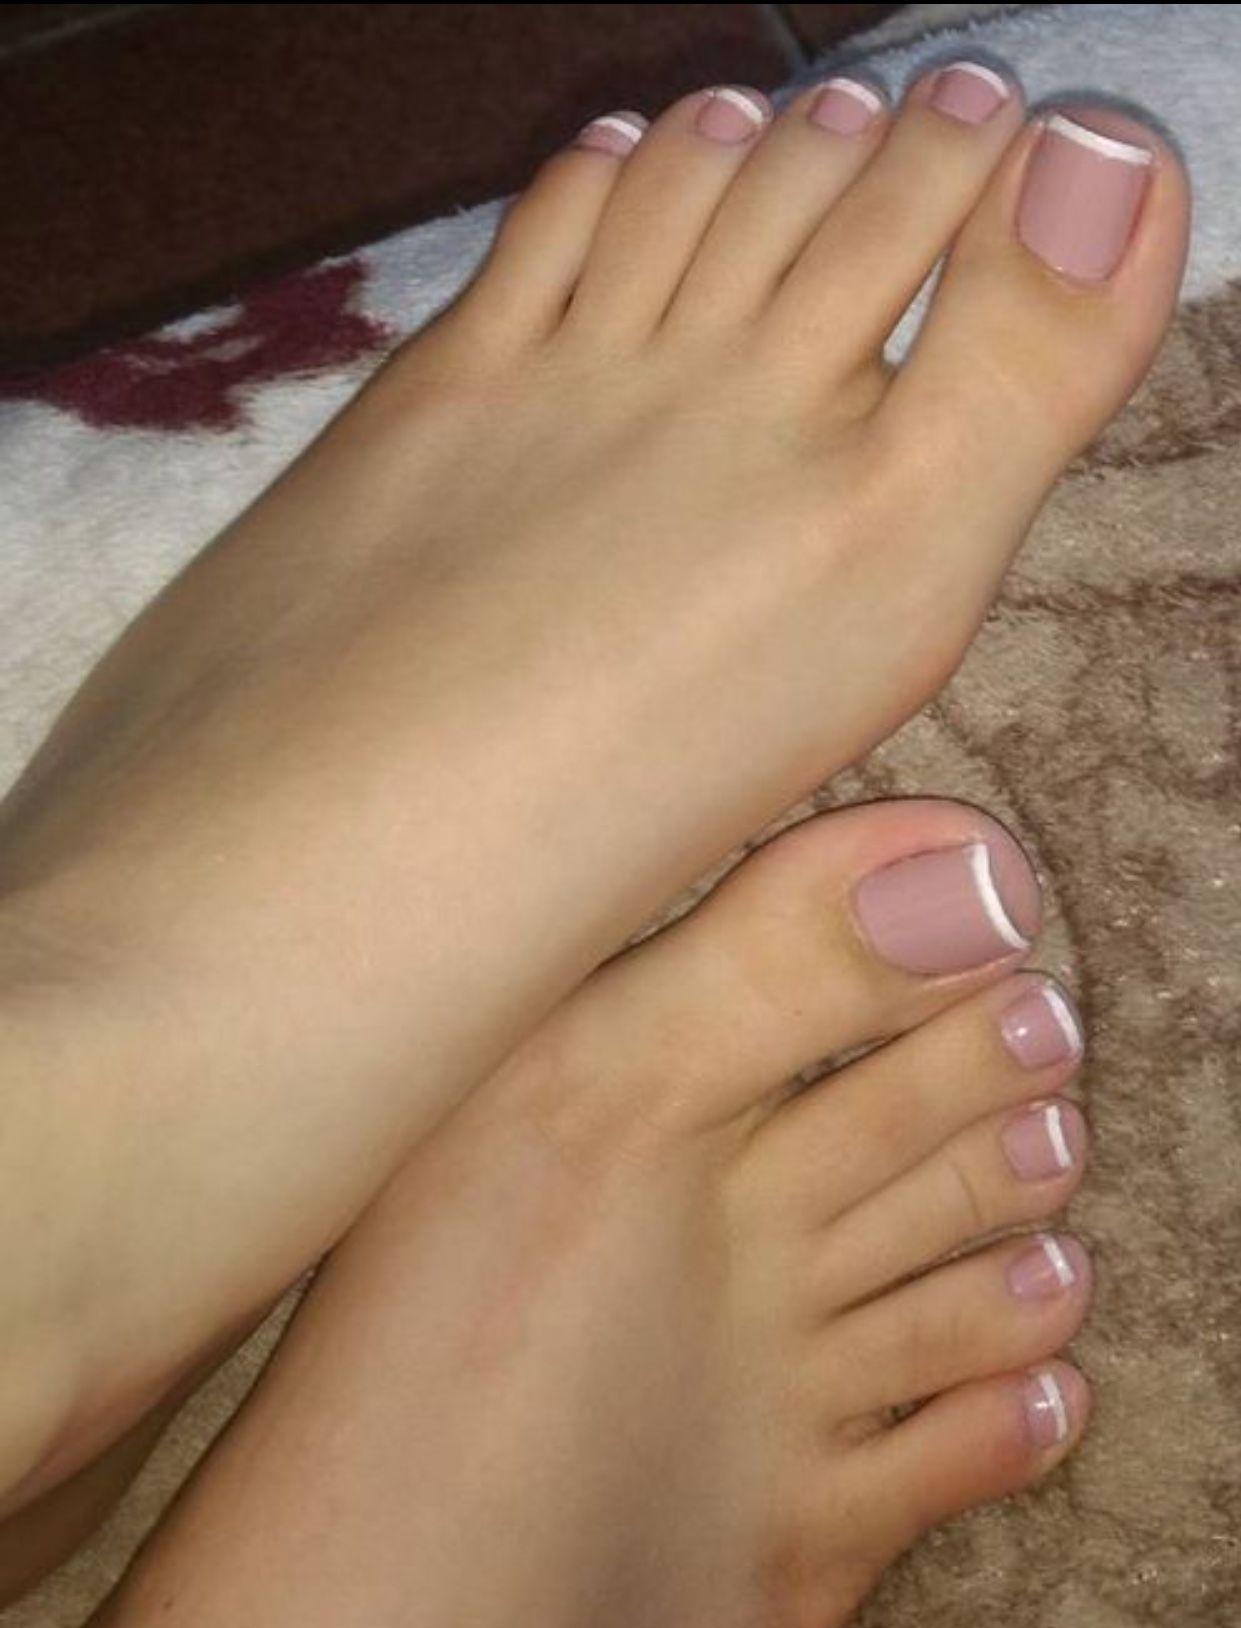 Pin By Layla Salim On Oh Them Beautiful Feet And Toes 4 Acrylic Toes Acrylic Toe Nails Toe Nails